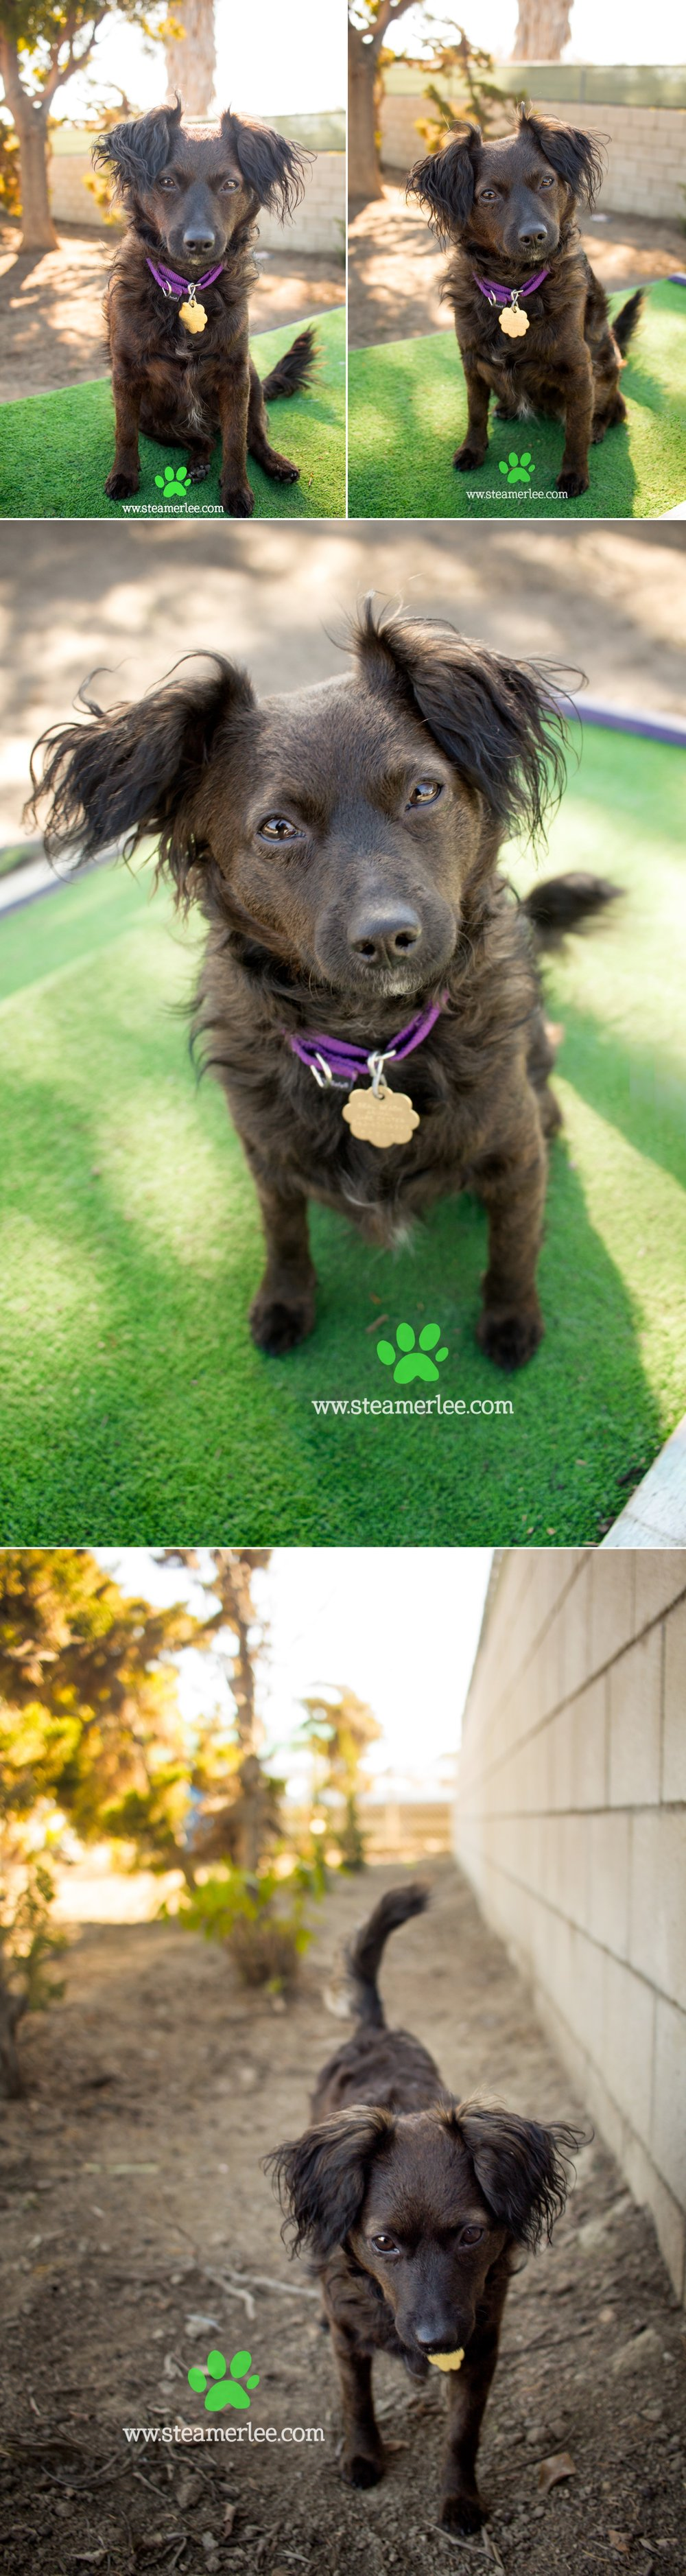 09 Steamer Lee Dog Photography - Seal Beach Animal Care Center.JPG